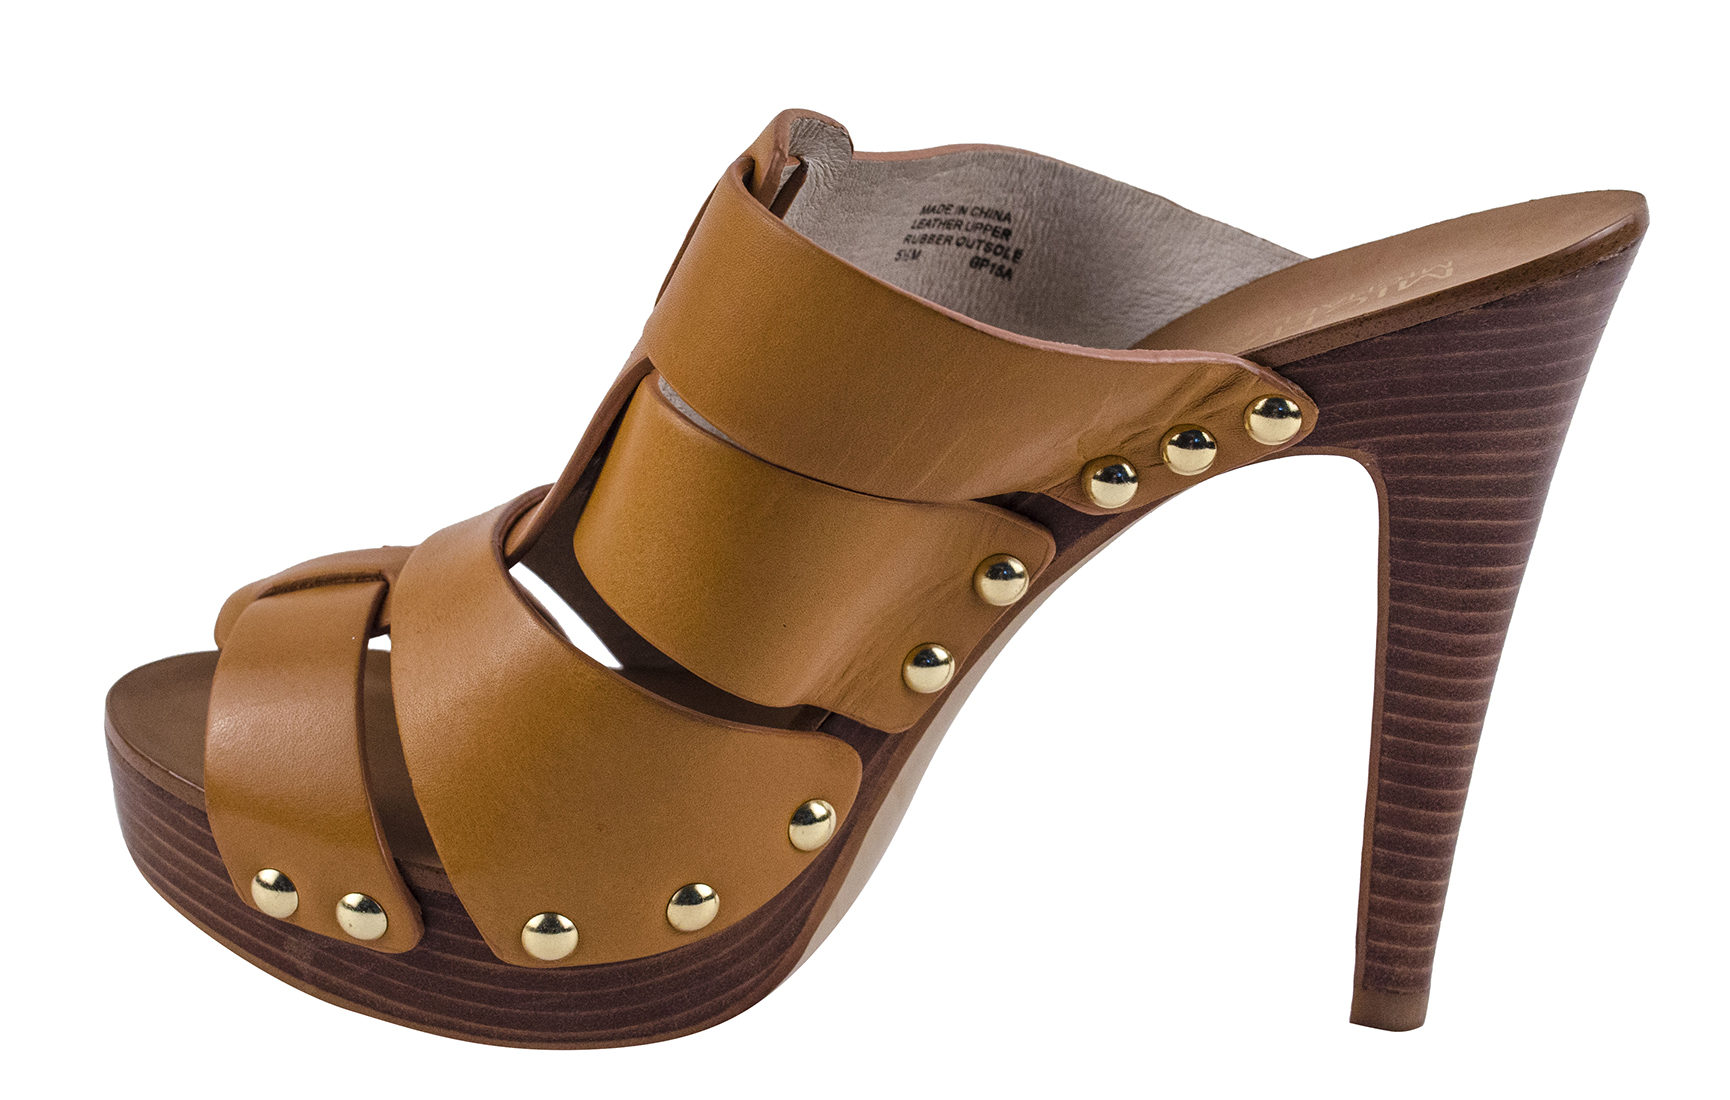 michael kors women 39 s somerly high heel mule sandals shoes. Black Bedroom Furniture Sets. Home Design Ideas